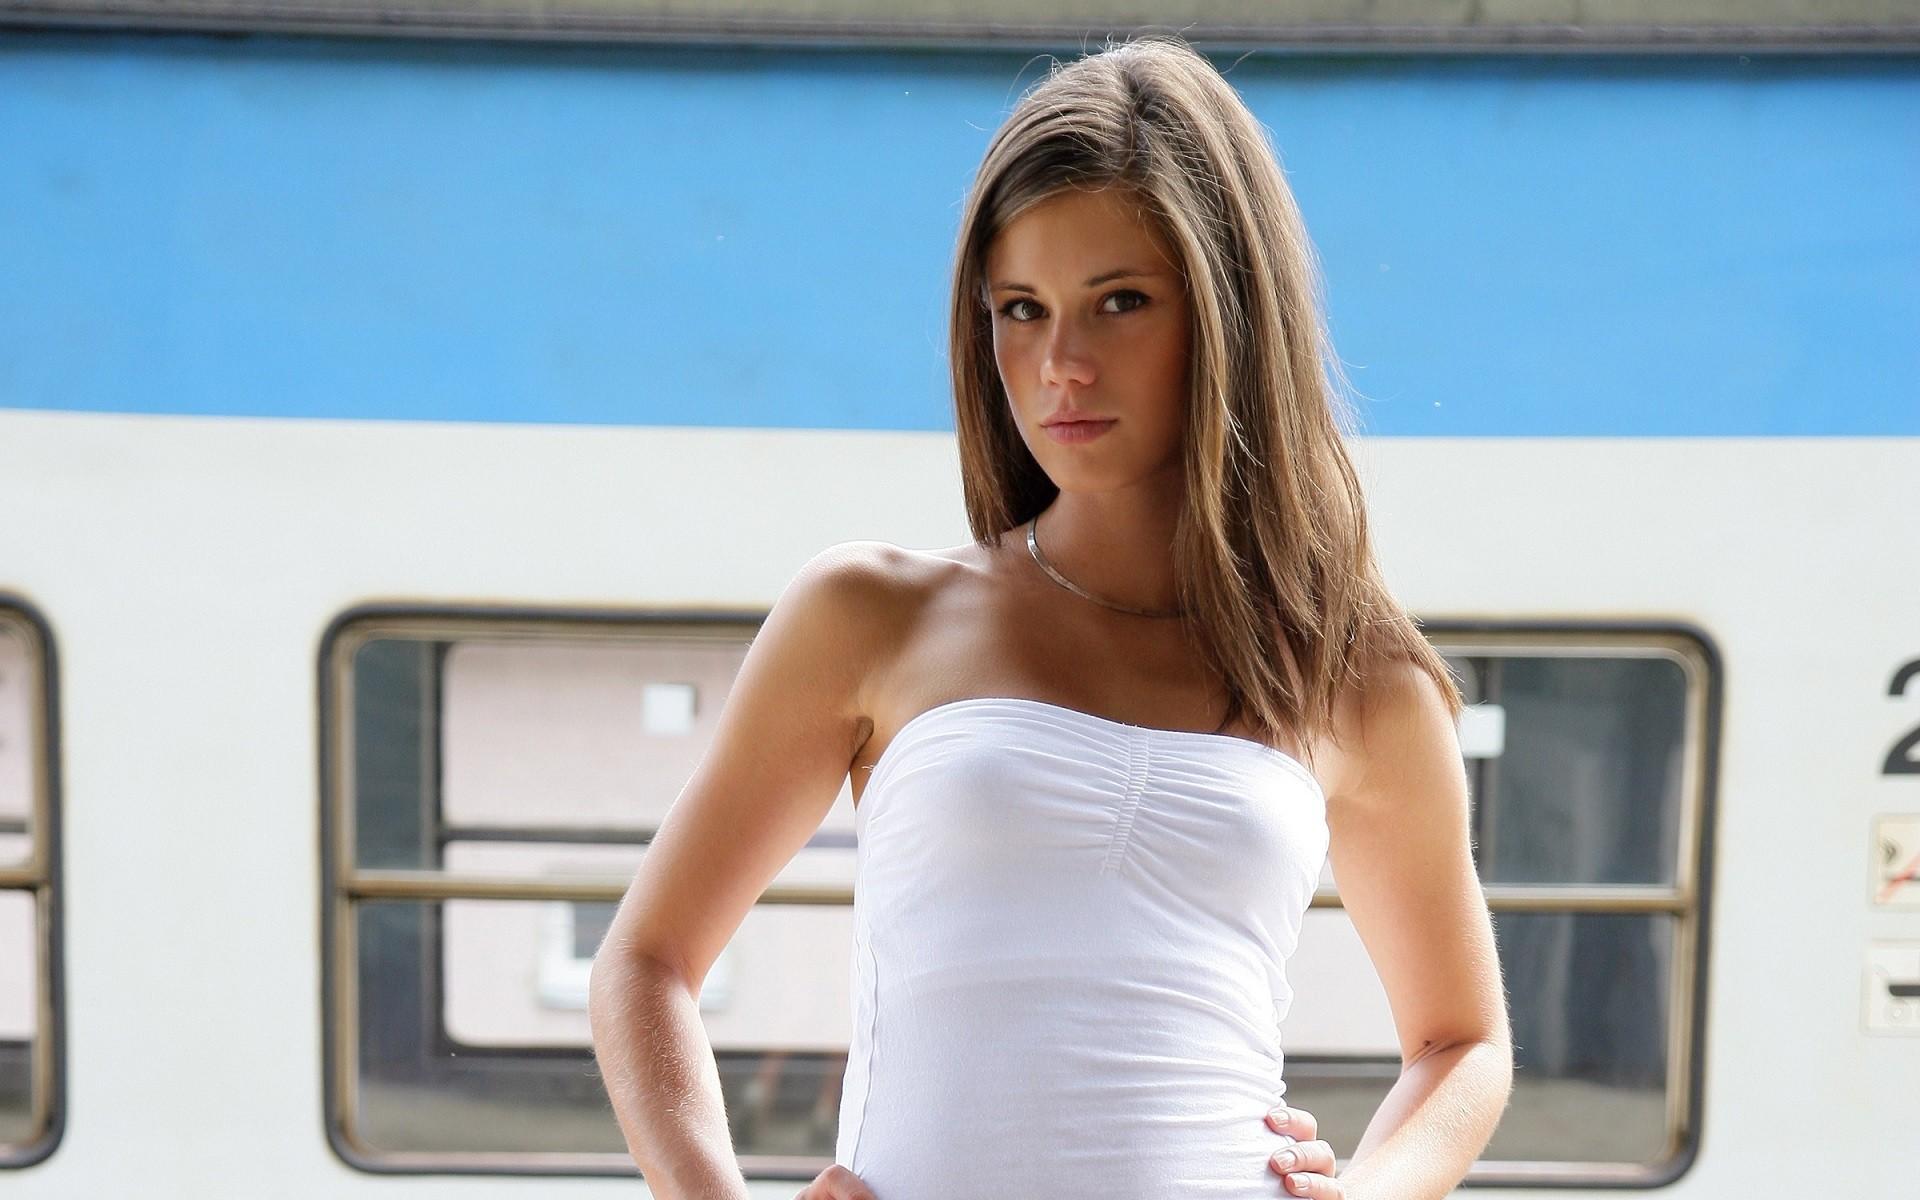 Markéta Stroblová, brunette, pornstar, hands on hips, legs